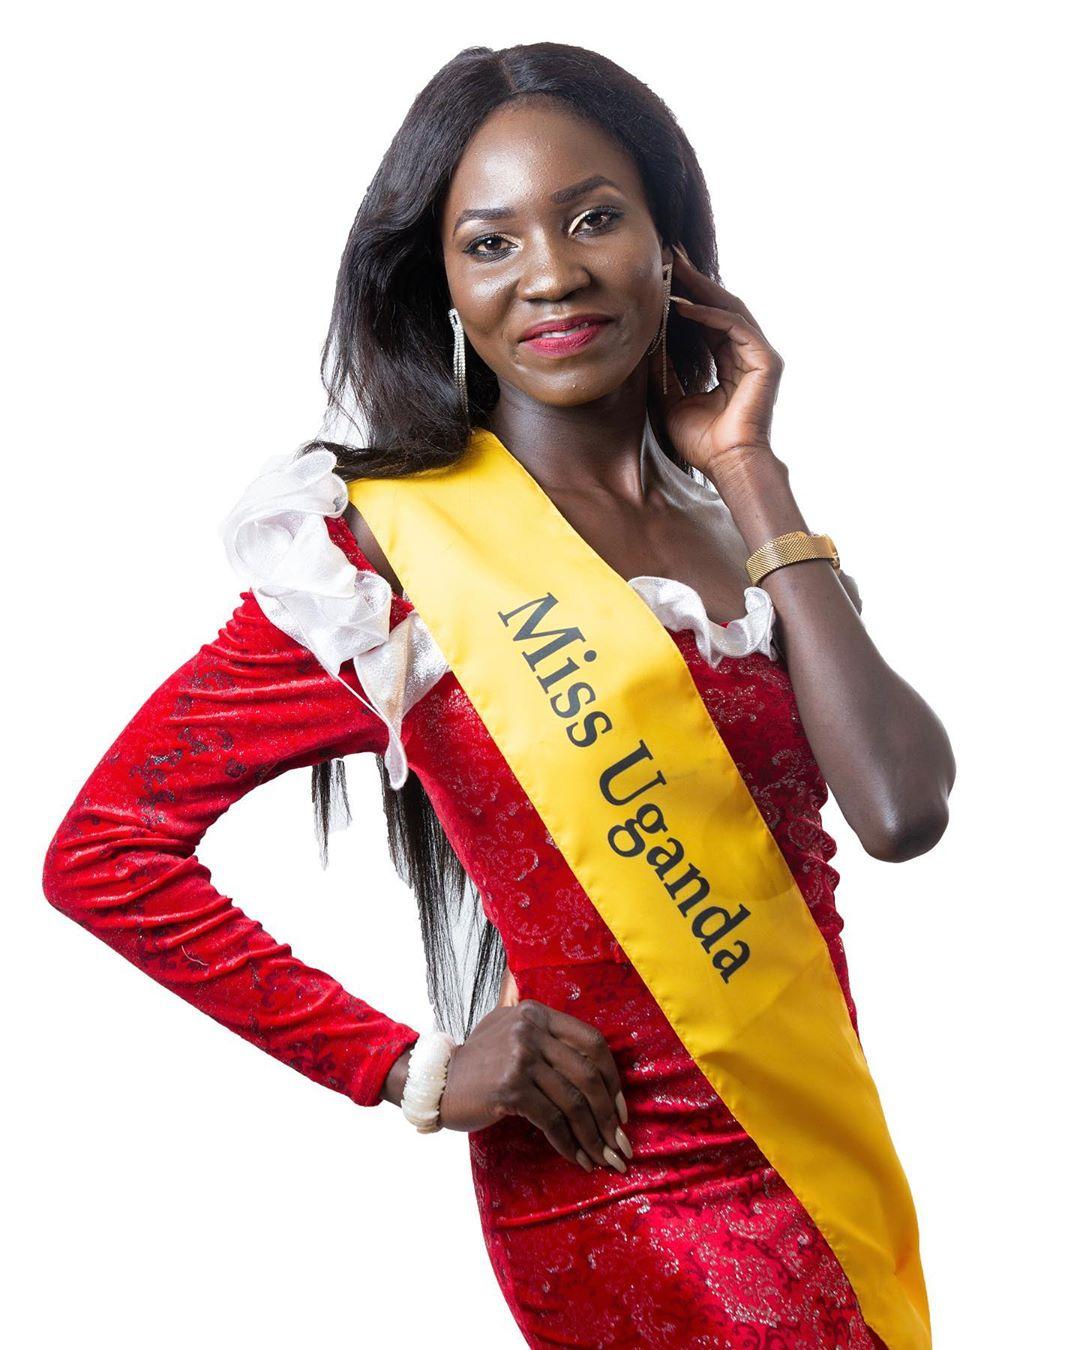 miss latvia vence miss great 2019. 1kOPIN